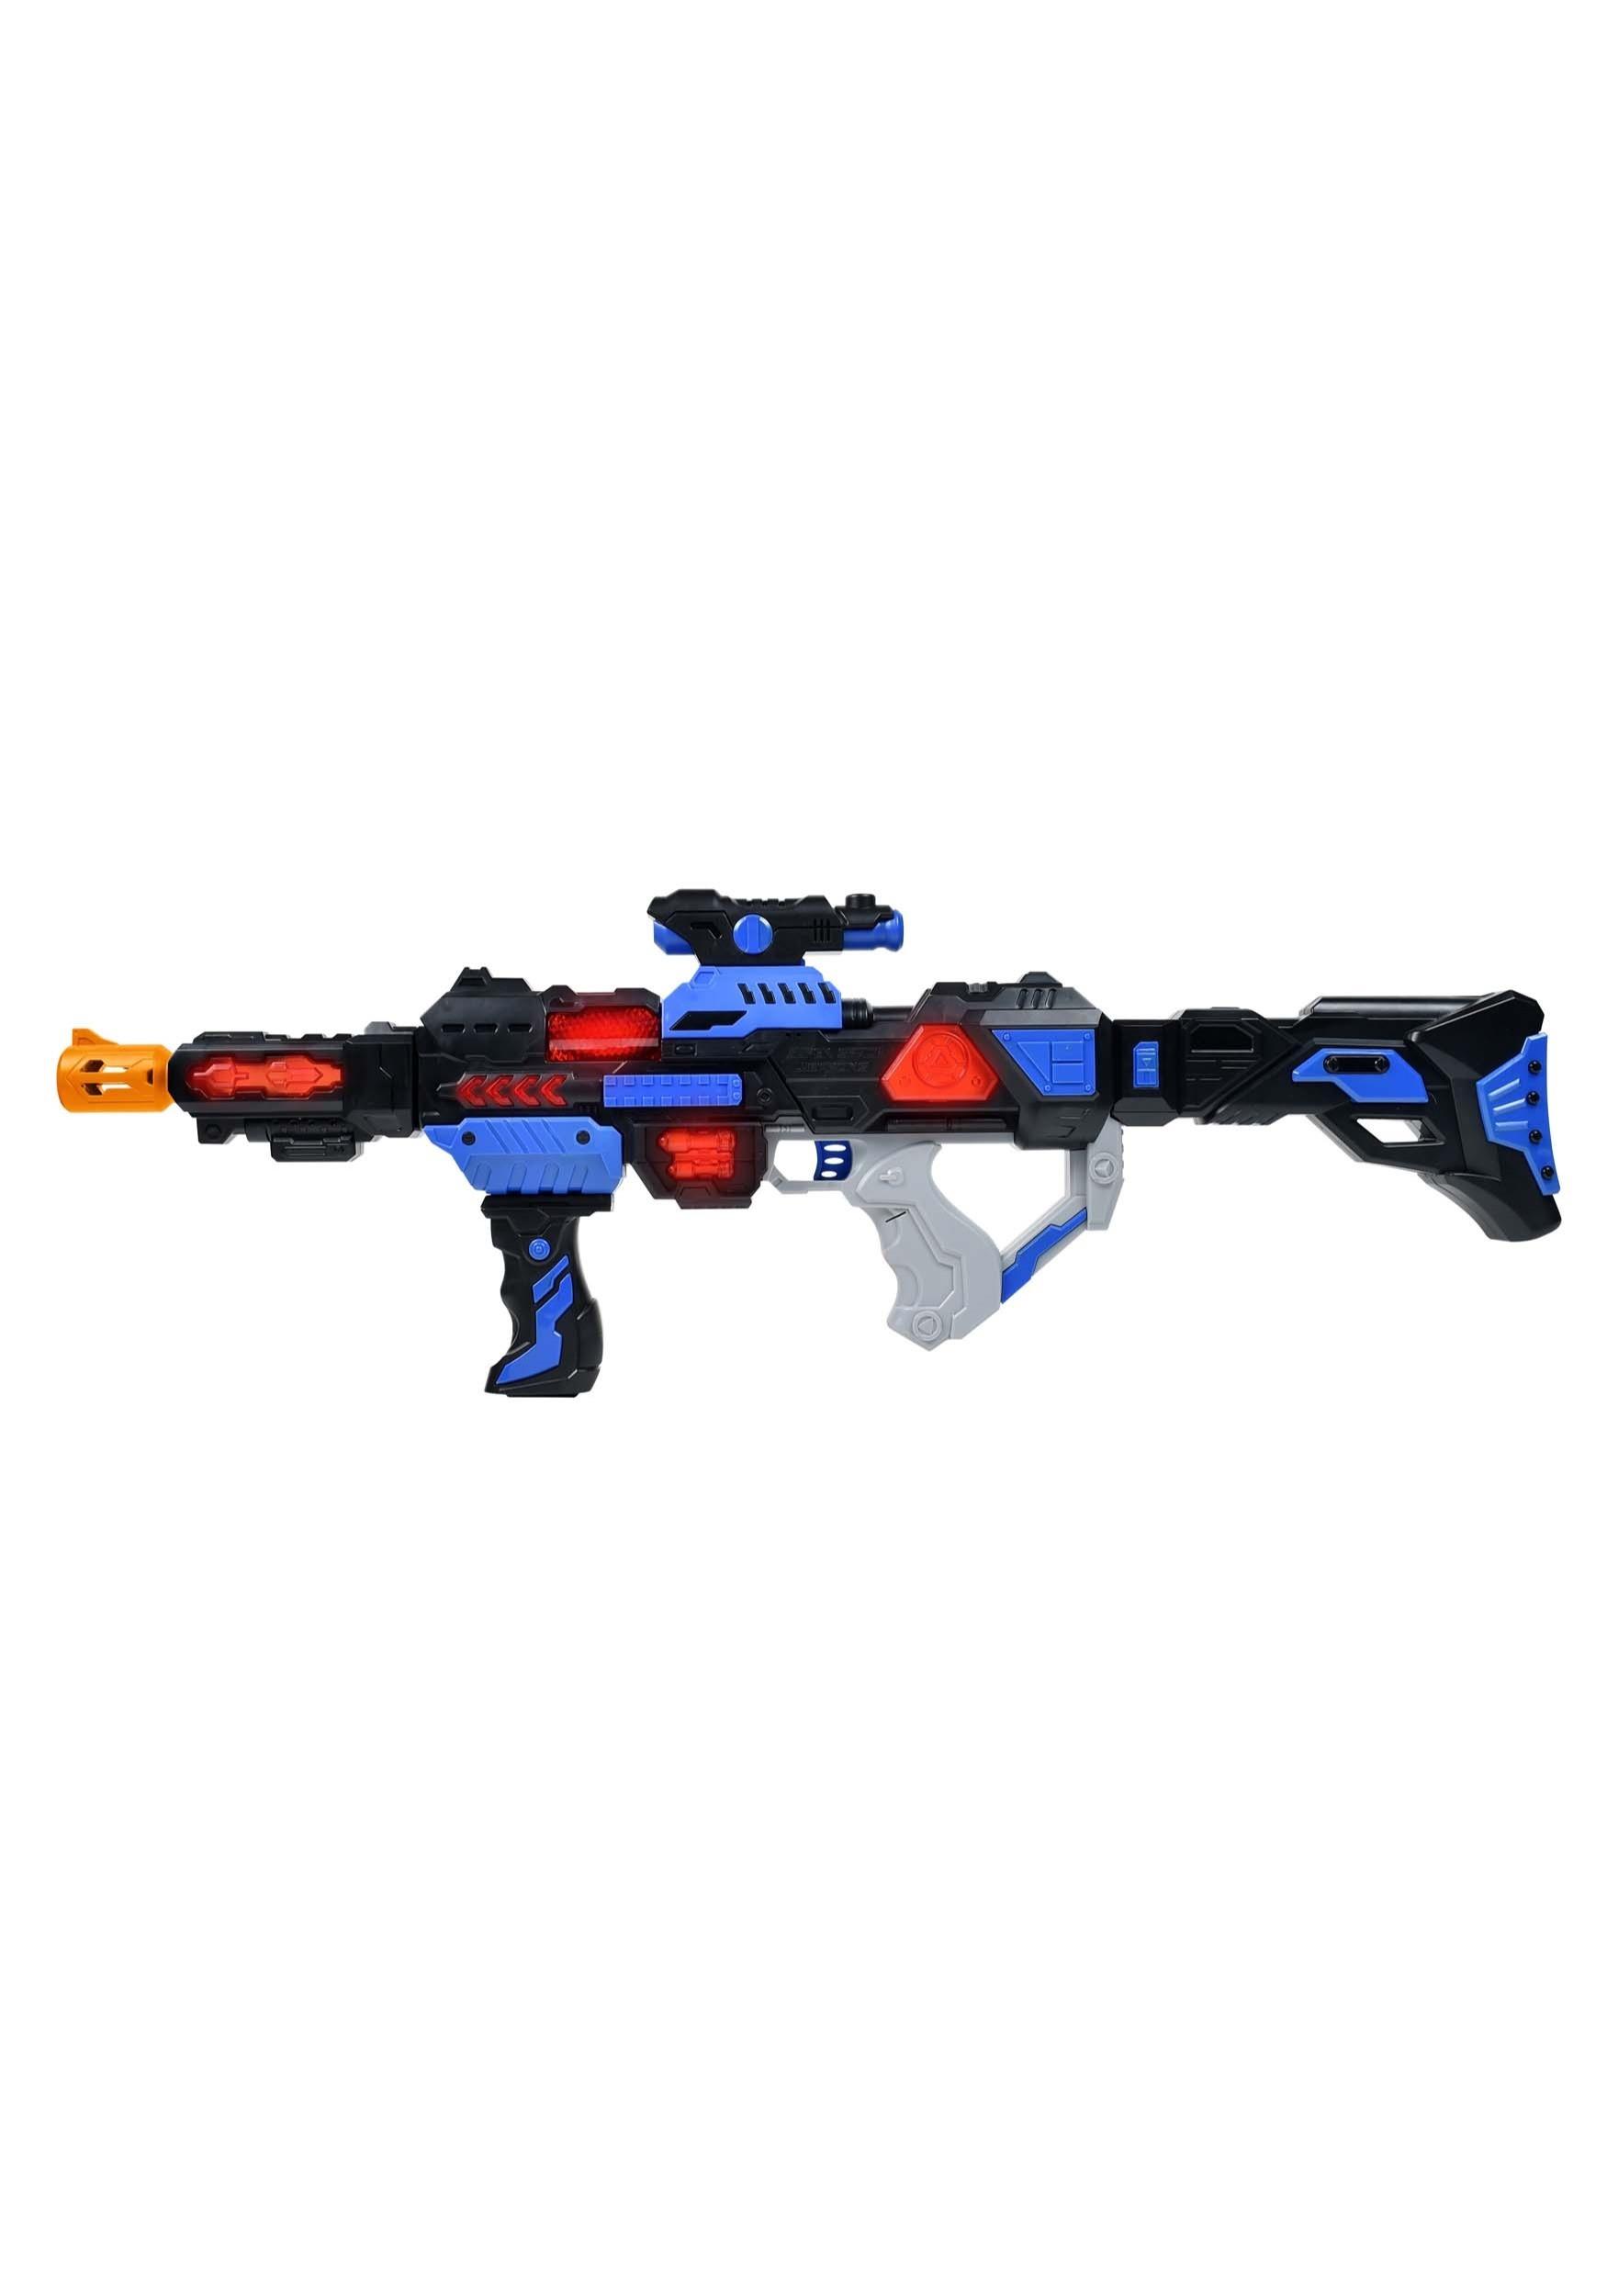 Maxx Action Galactic Series Photon Space Rifle SND101741